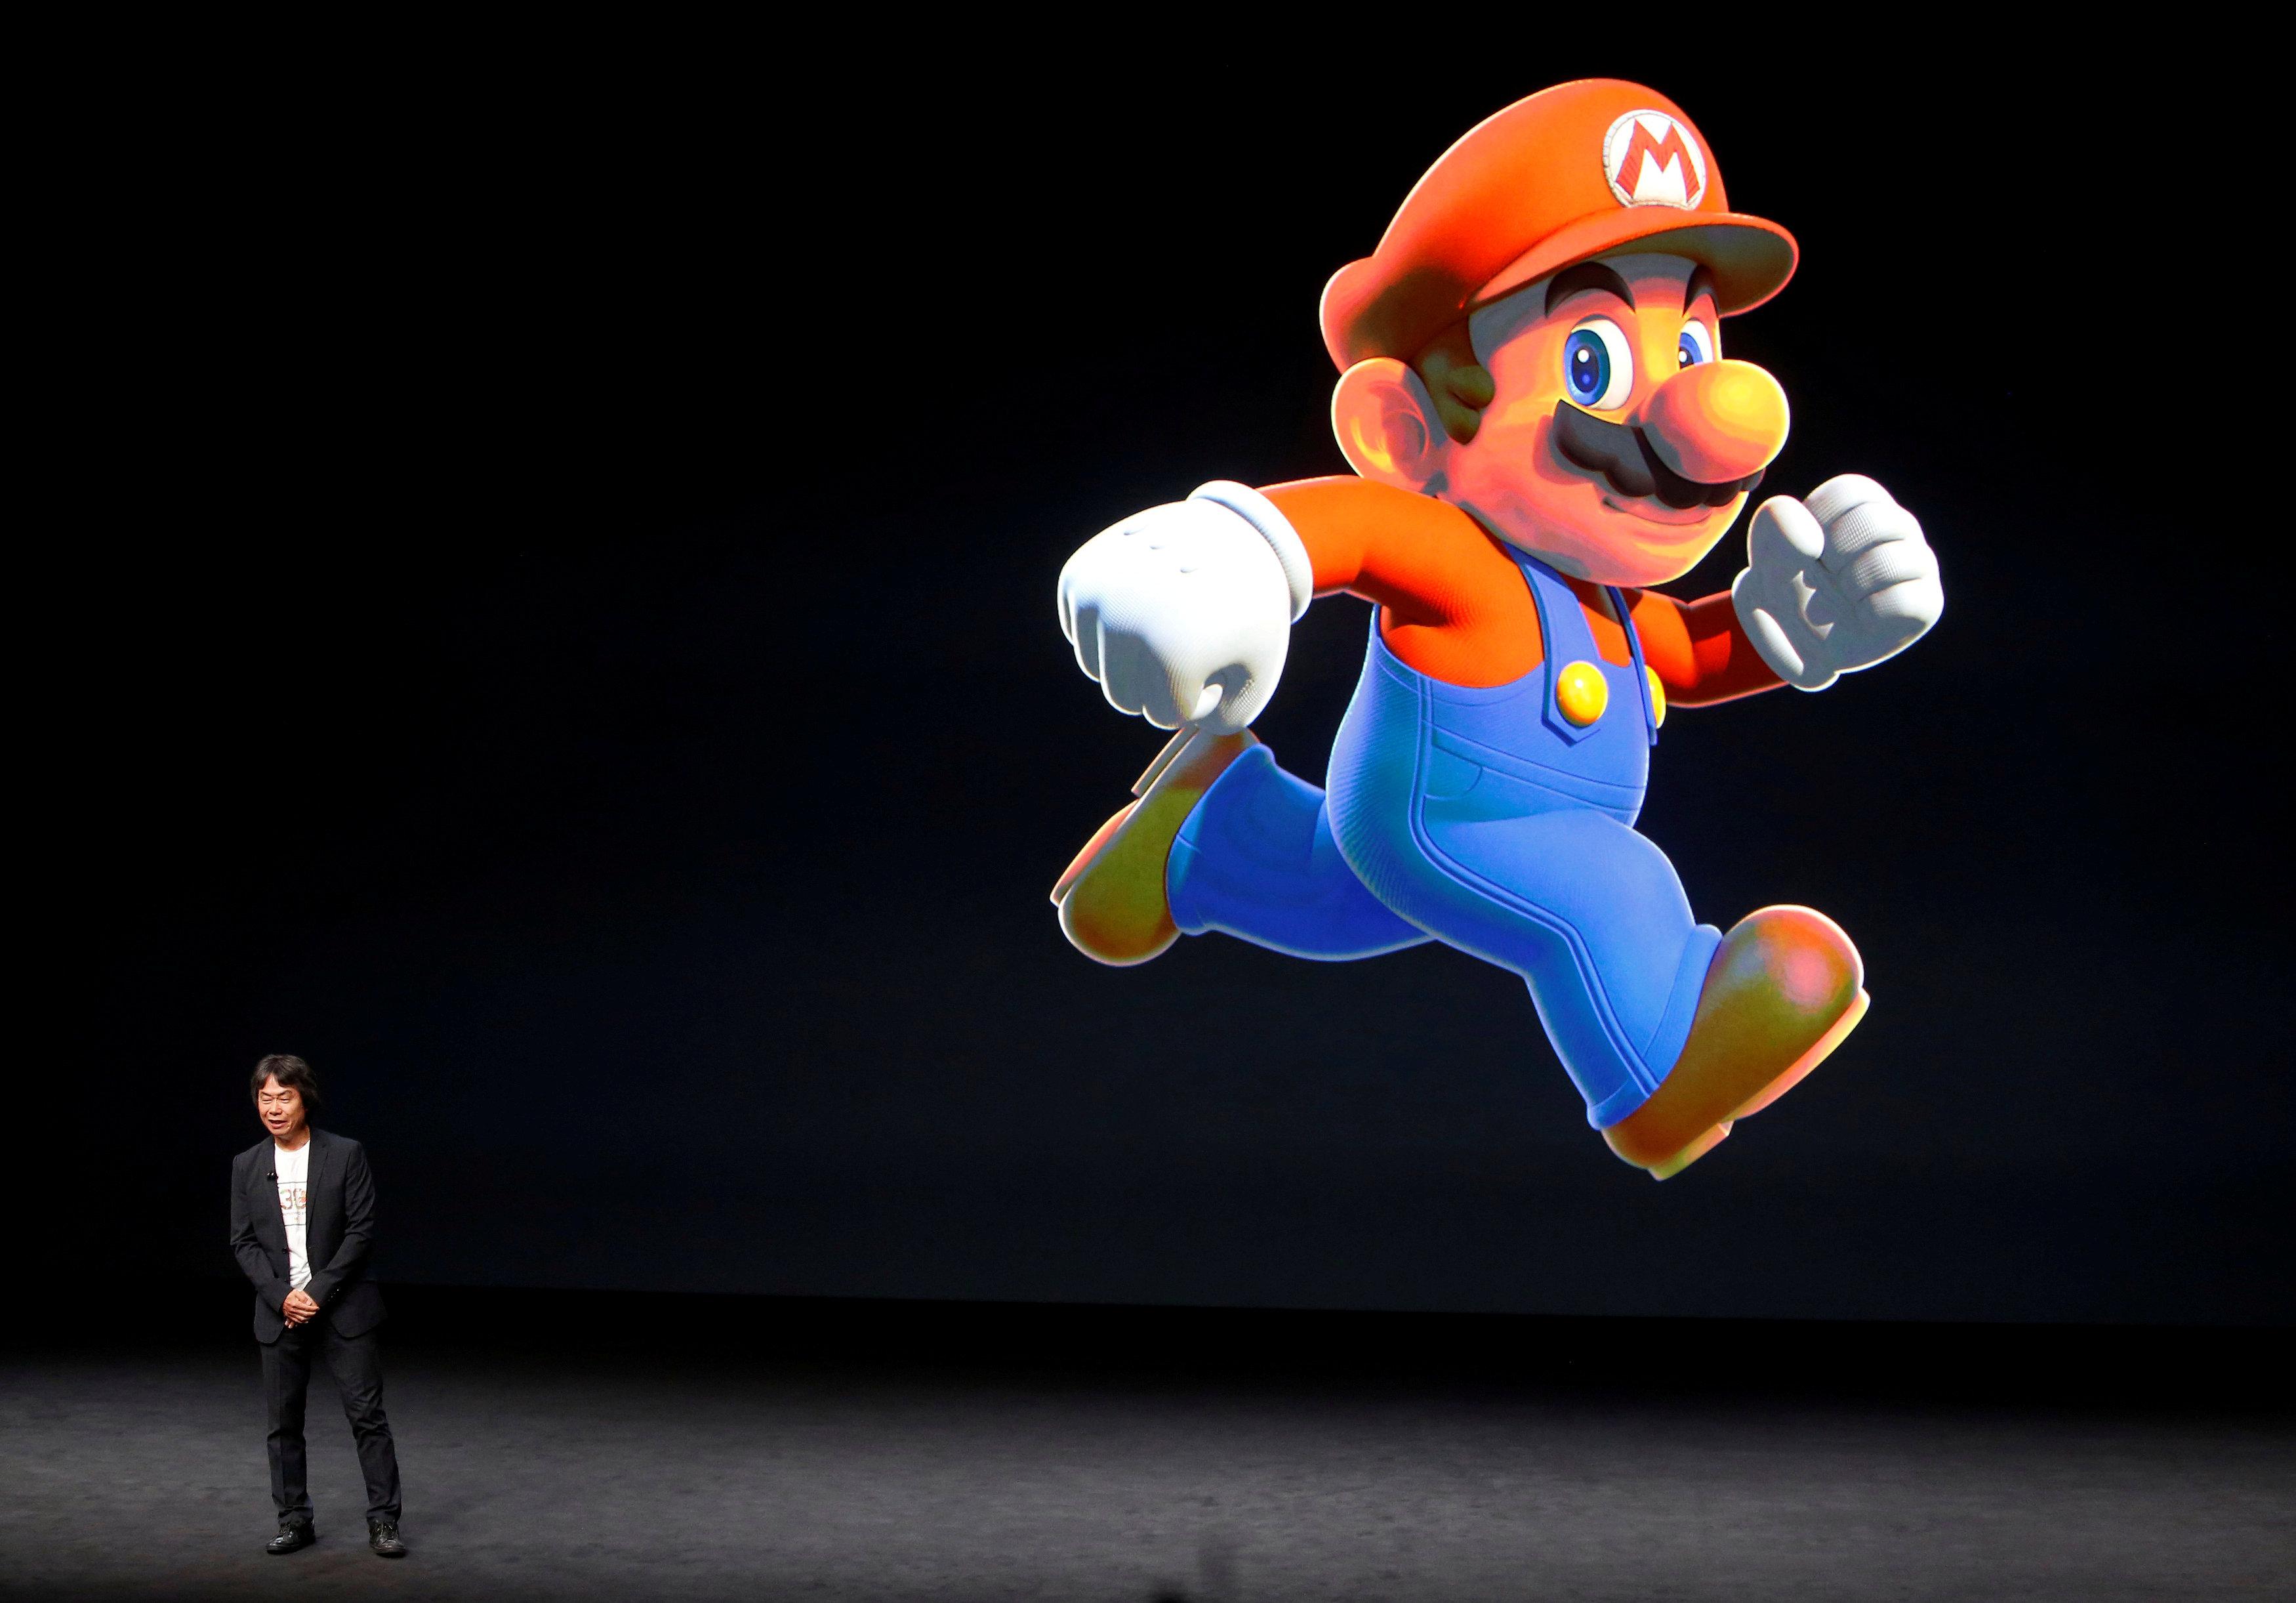 Nintendo's Big Day: Super Mario run tests mobile strategy